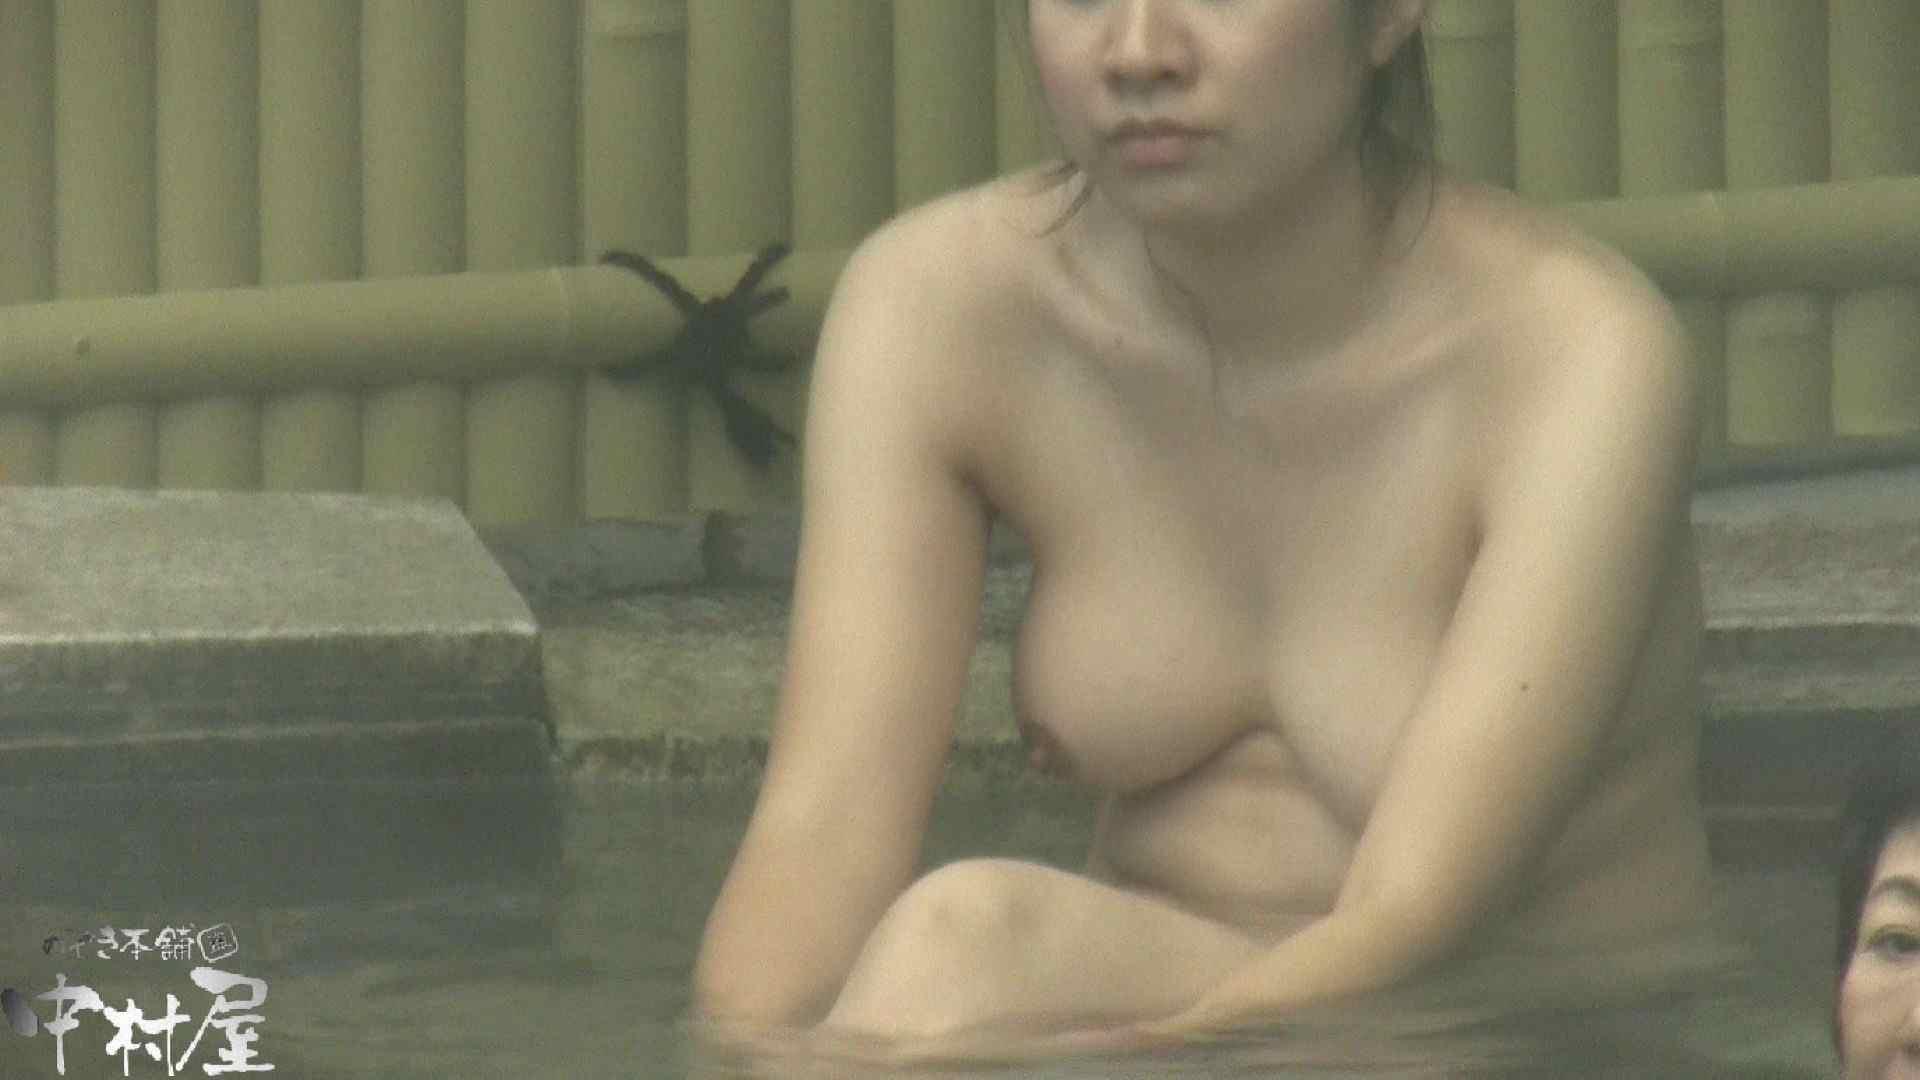 Aquaな露天風呂Vol.913 いやらしいOL アダルト動画キャプチャ 65連発 17